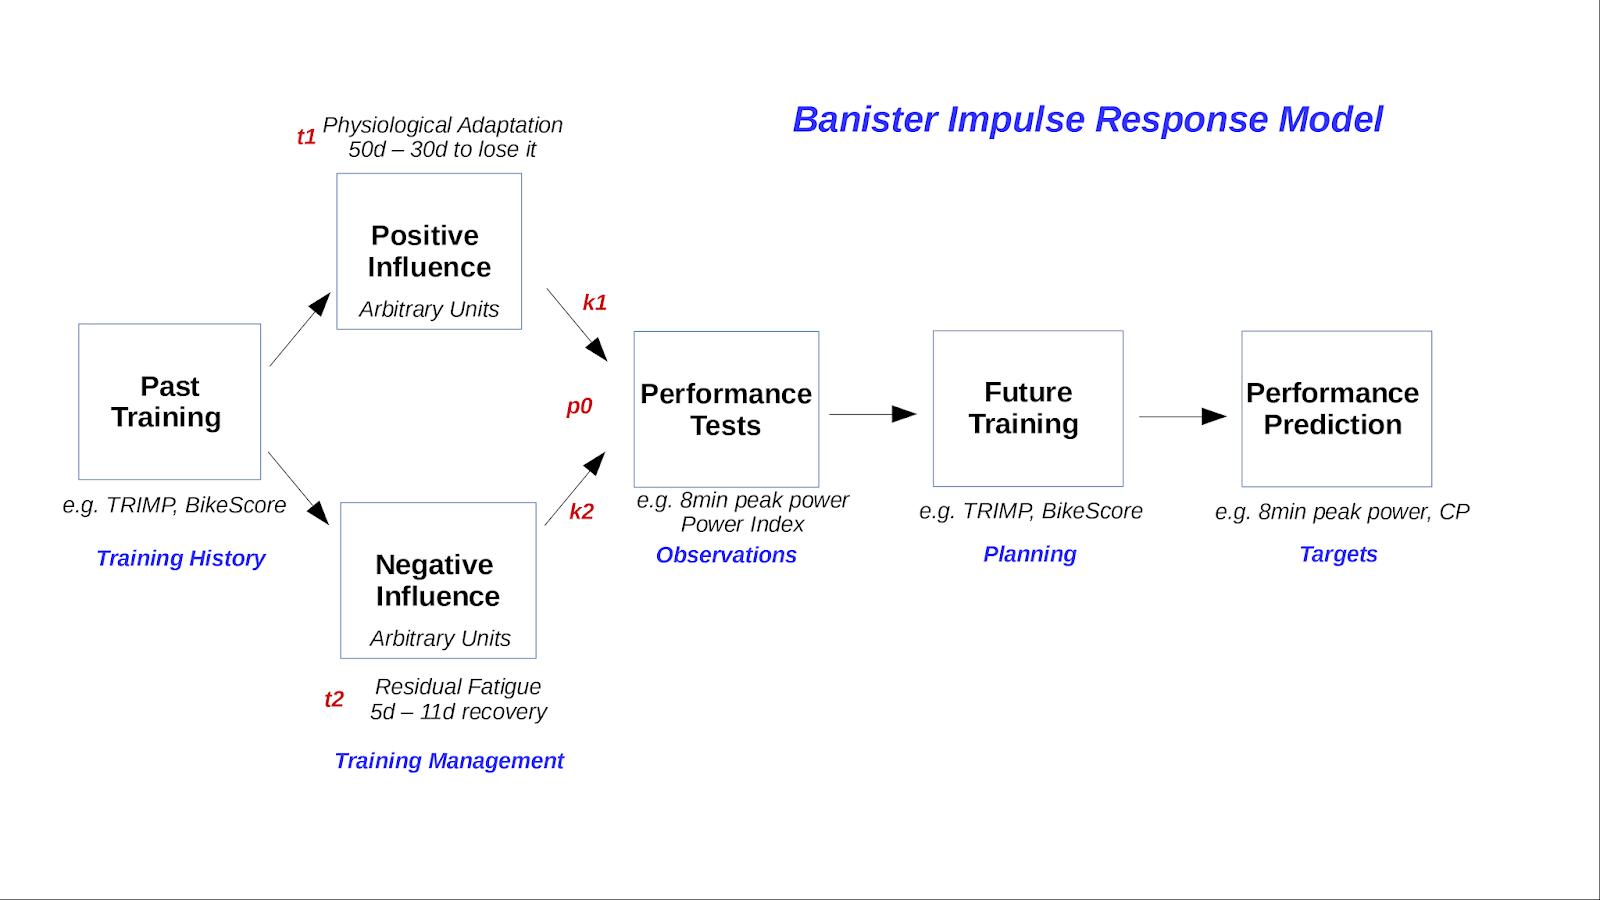 Implementing the Banister Impulse-Response Model in GoldenCheetah